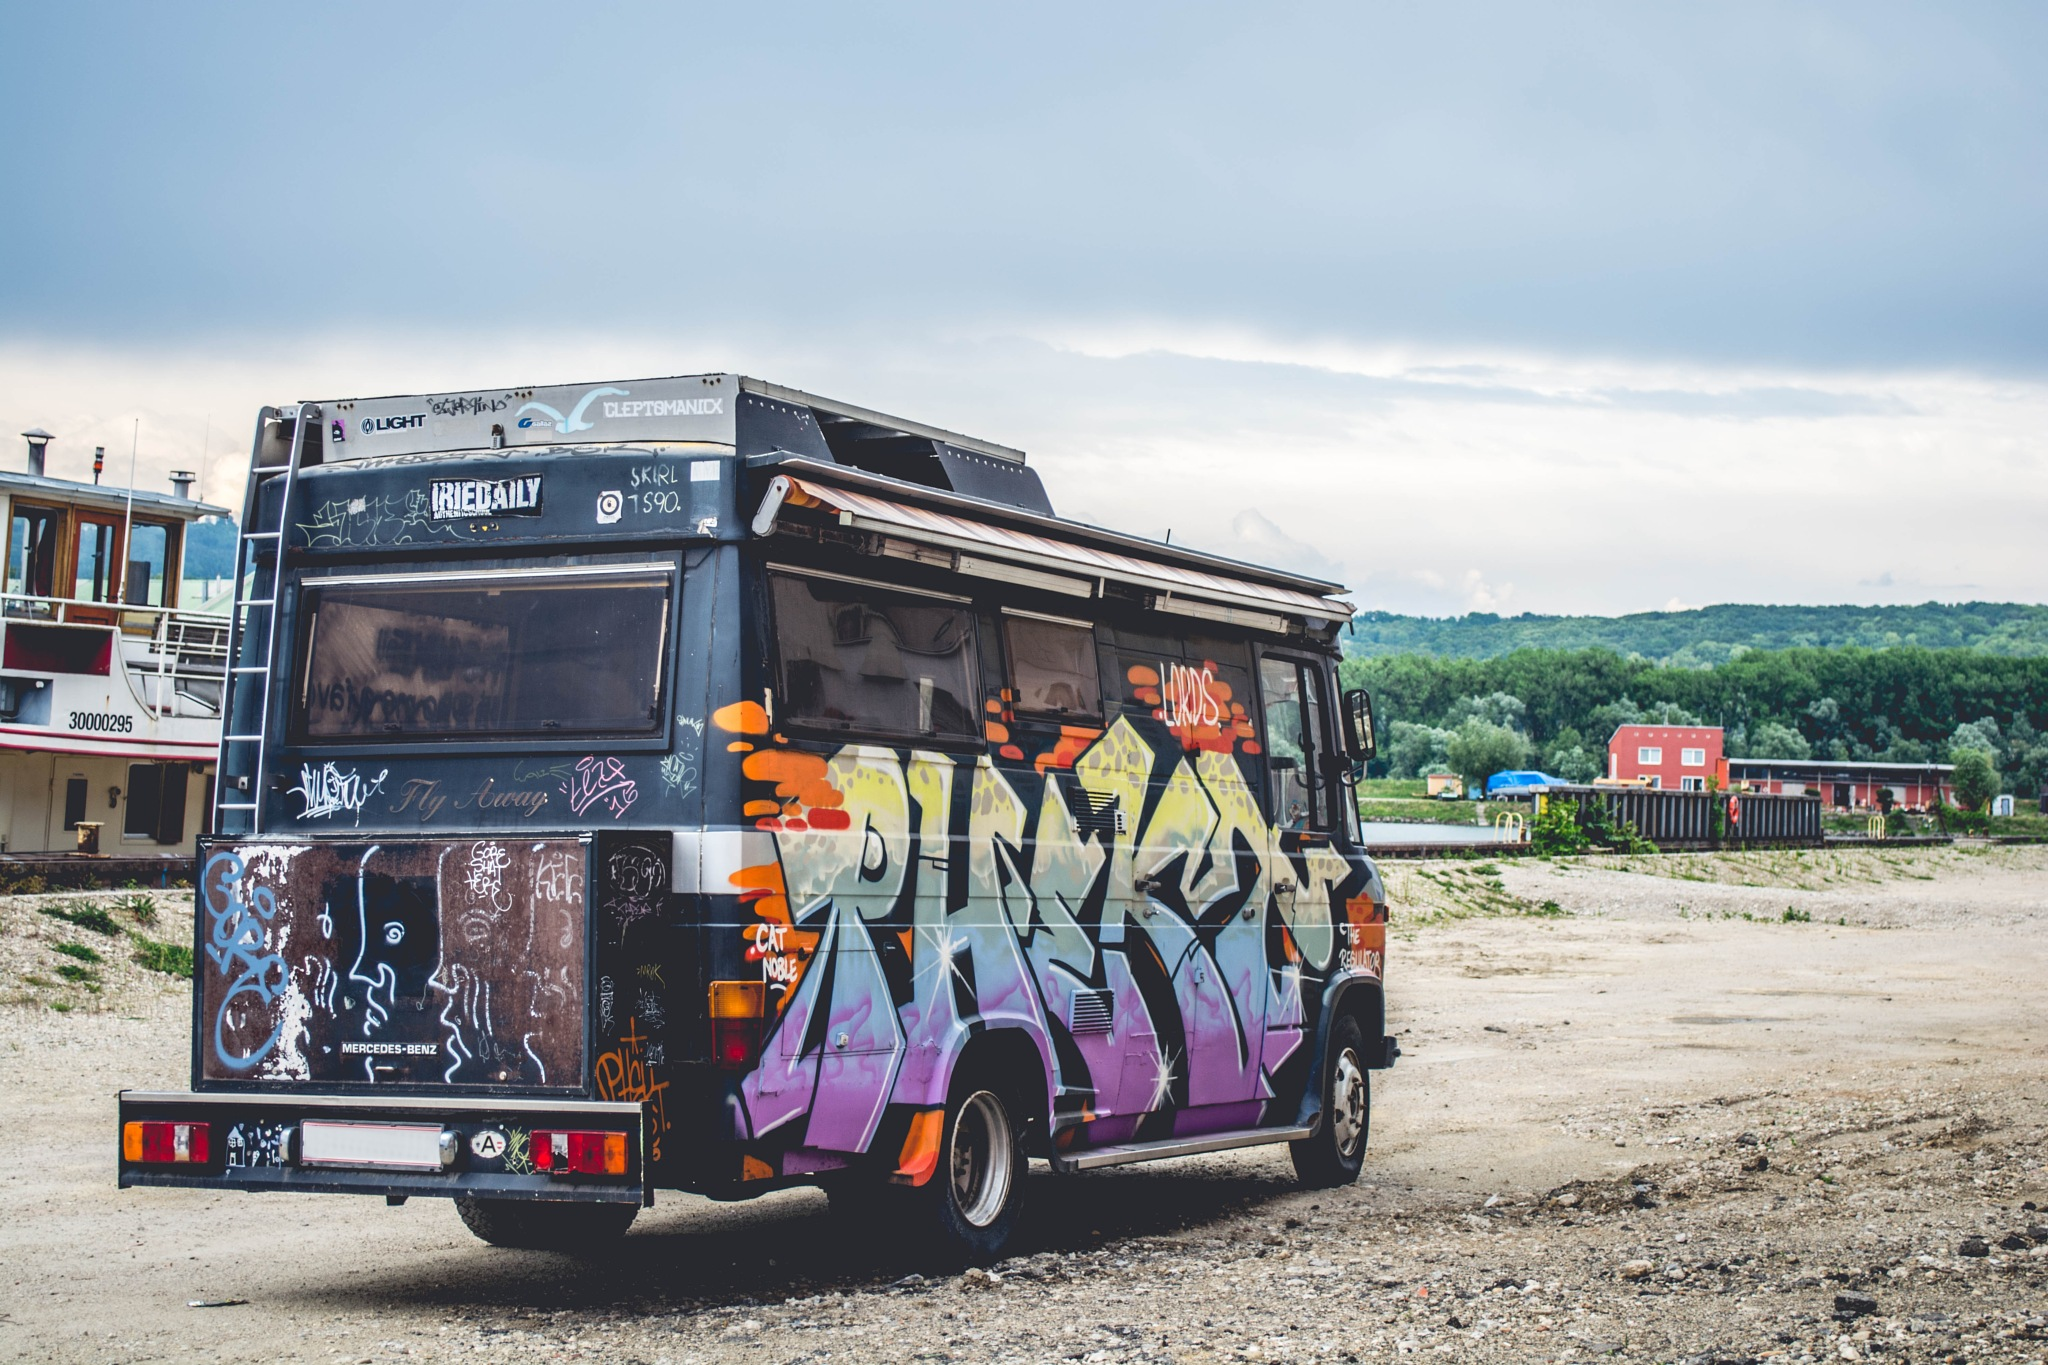 dope bus by fotografierende